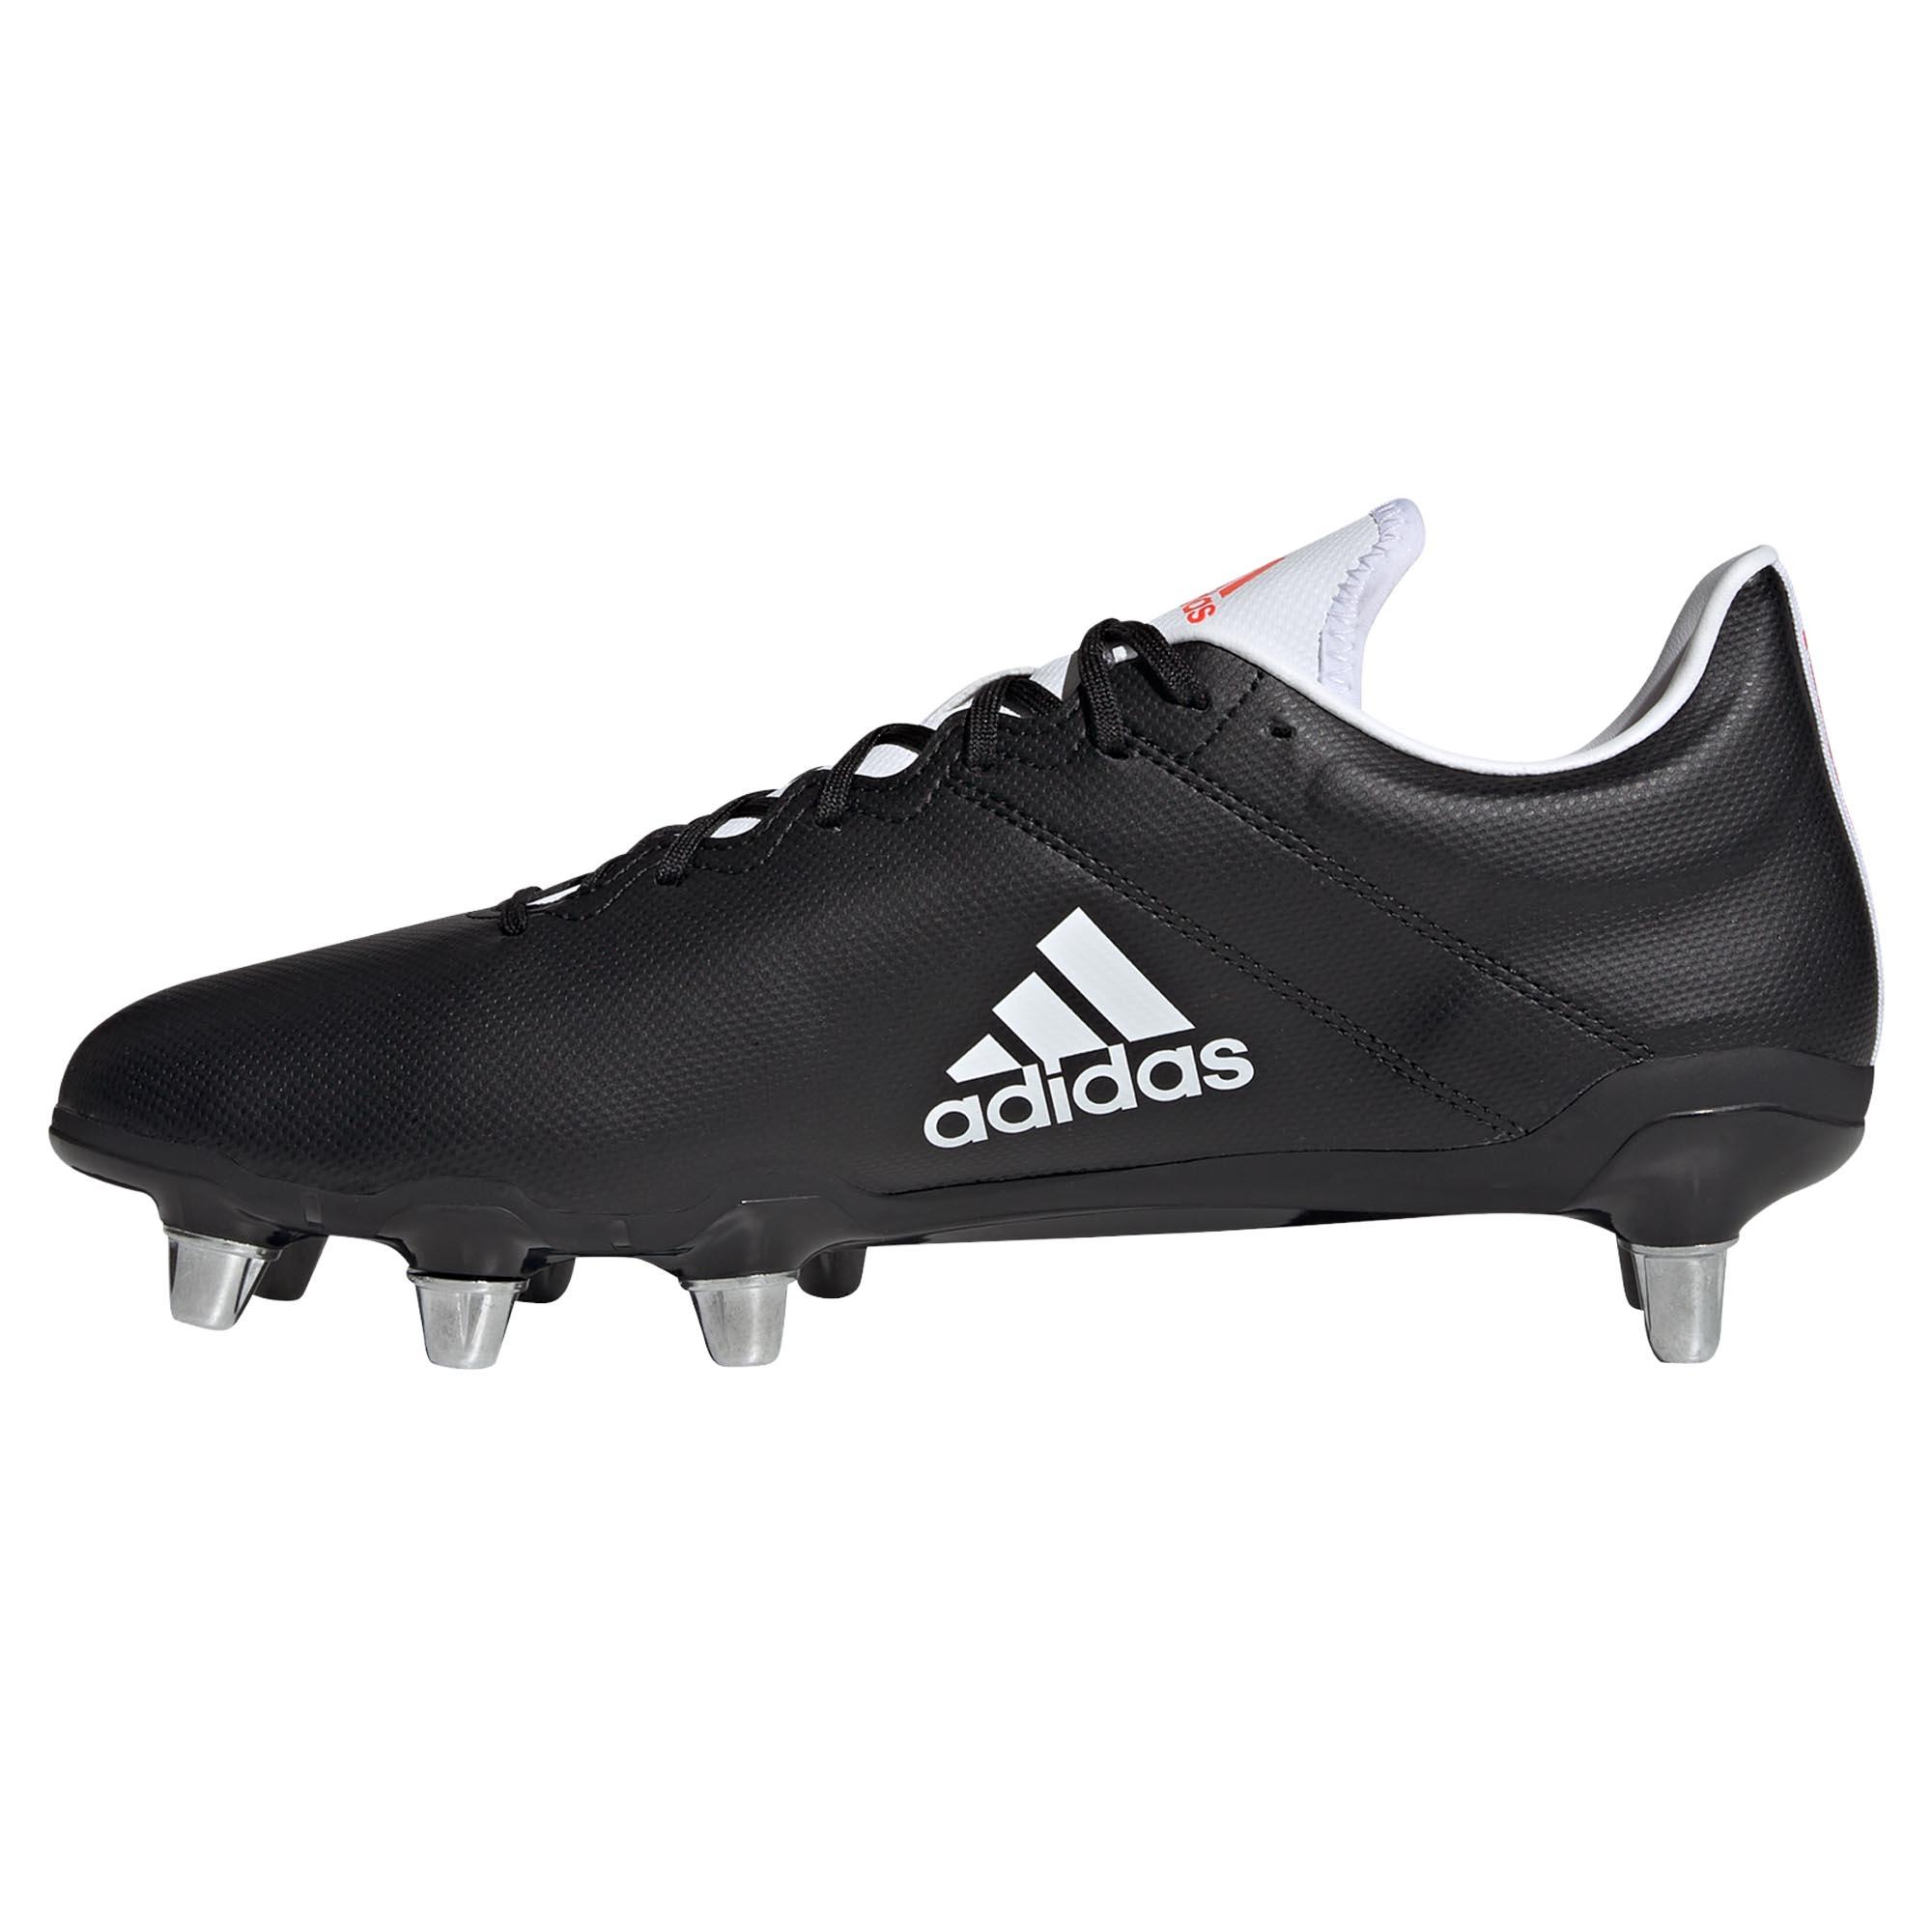 miniature 7 - Adidas Kakari SG Terrain Souple Adulte Unisexe Rugby Union Boot Noir/Blanc